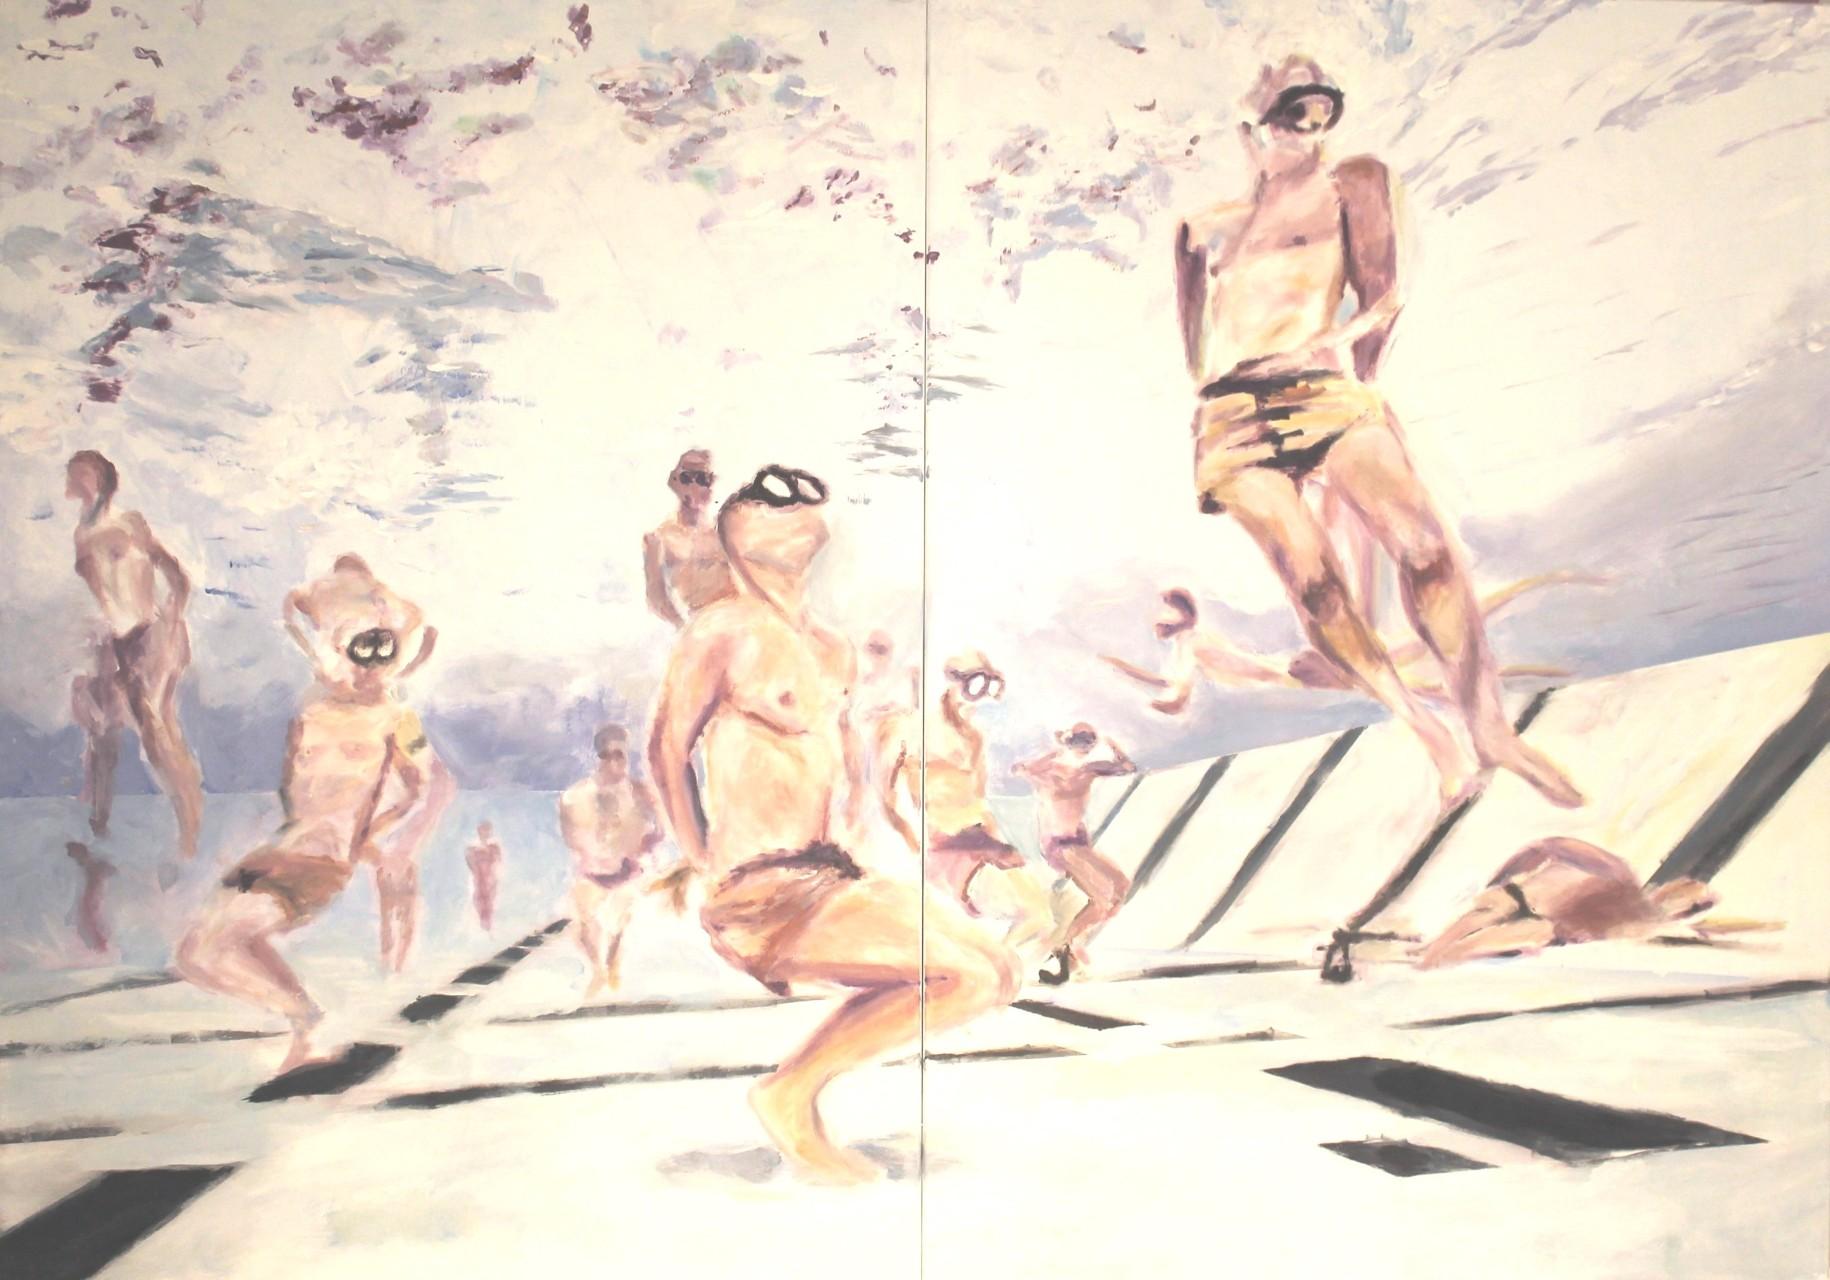 Submerged, 2015, Öl auf Leinwand, 140 x 200 cm, diptych.